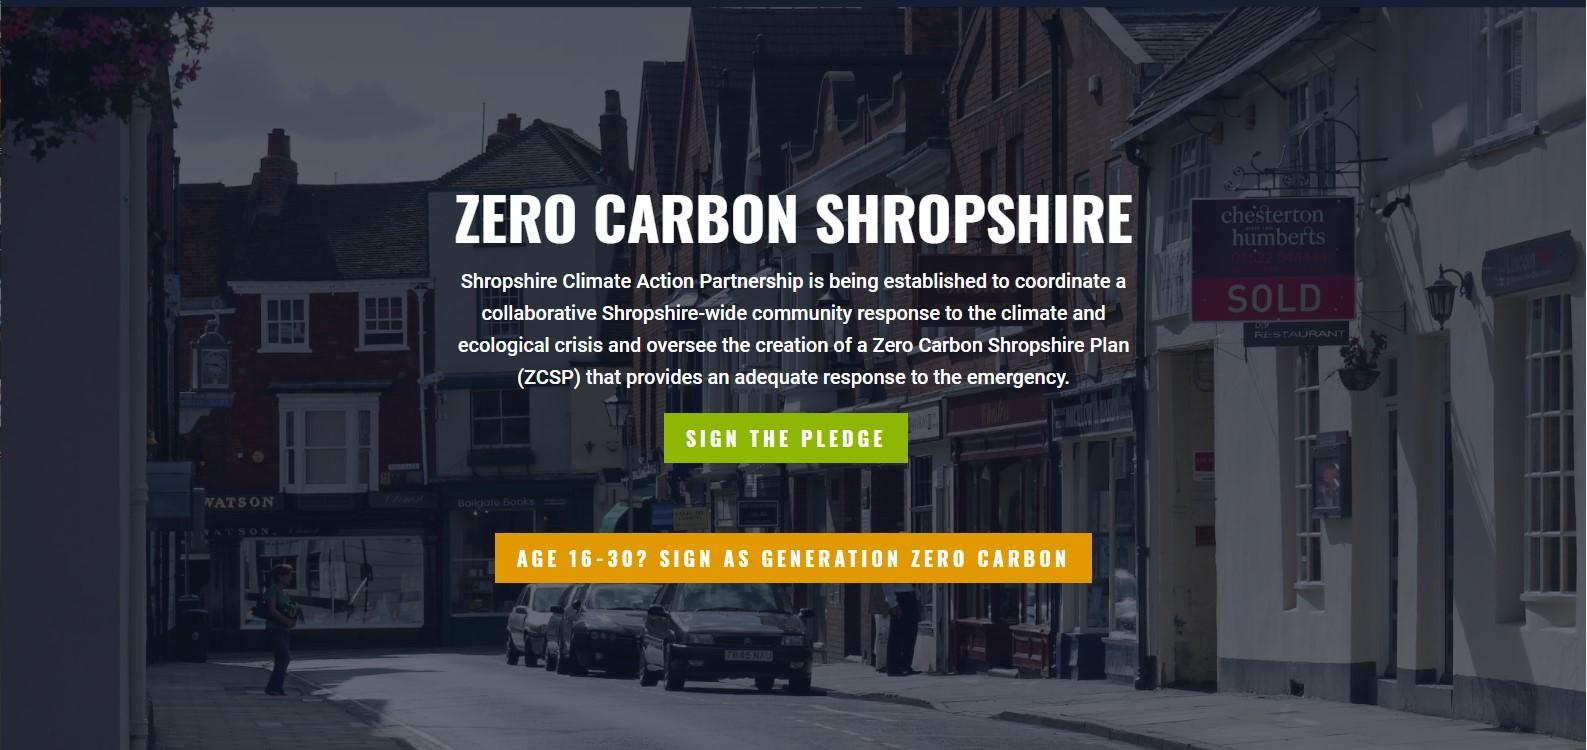 Zero Carbon Shropshire screenshot